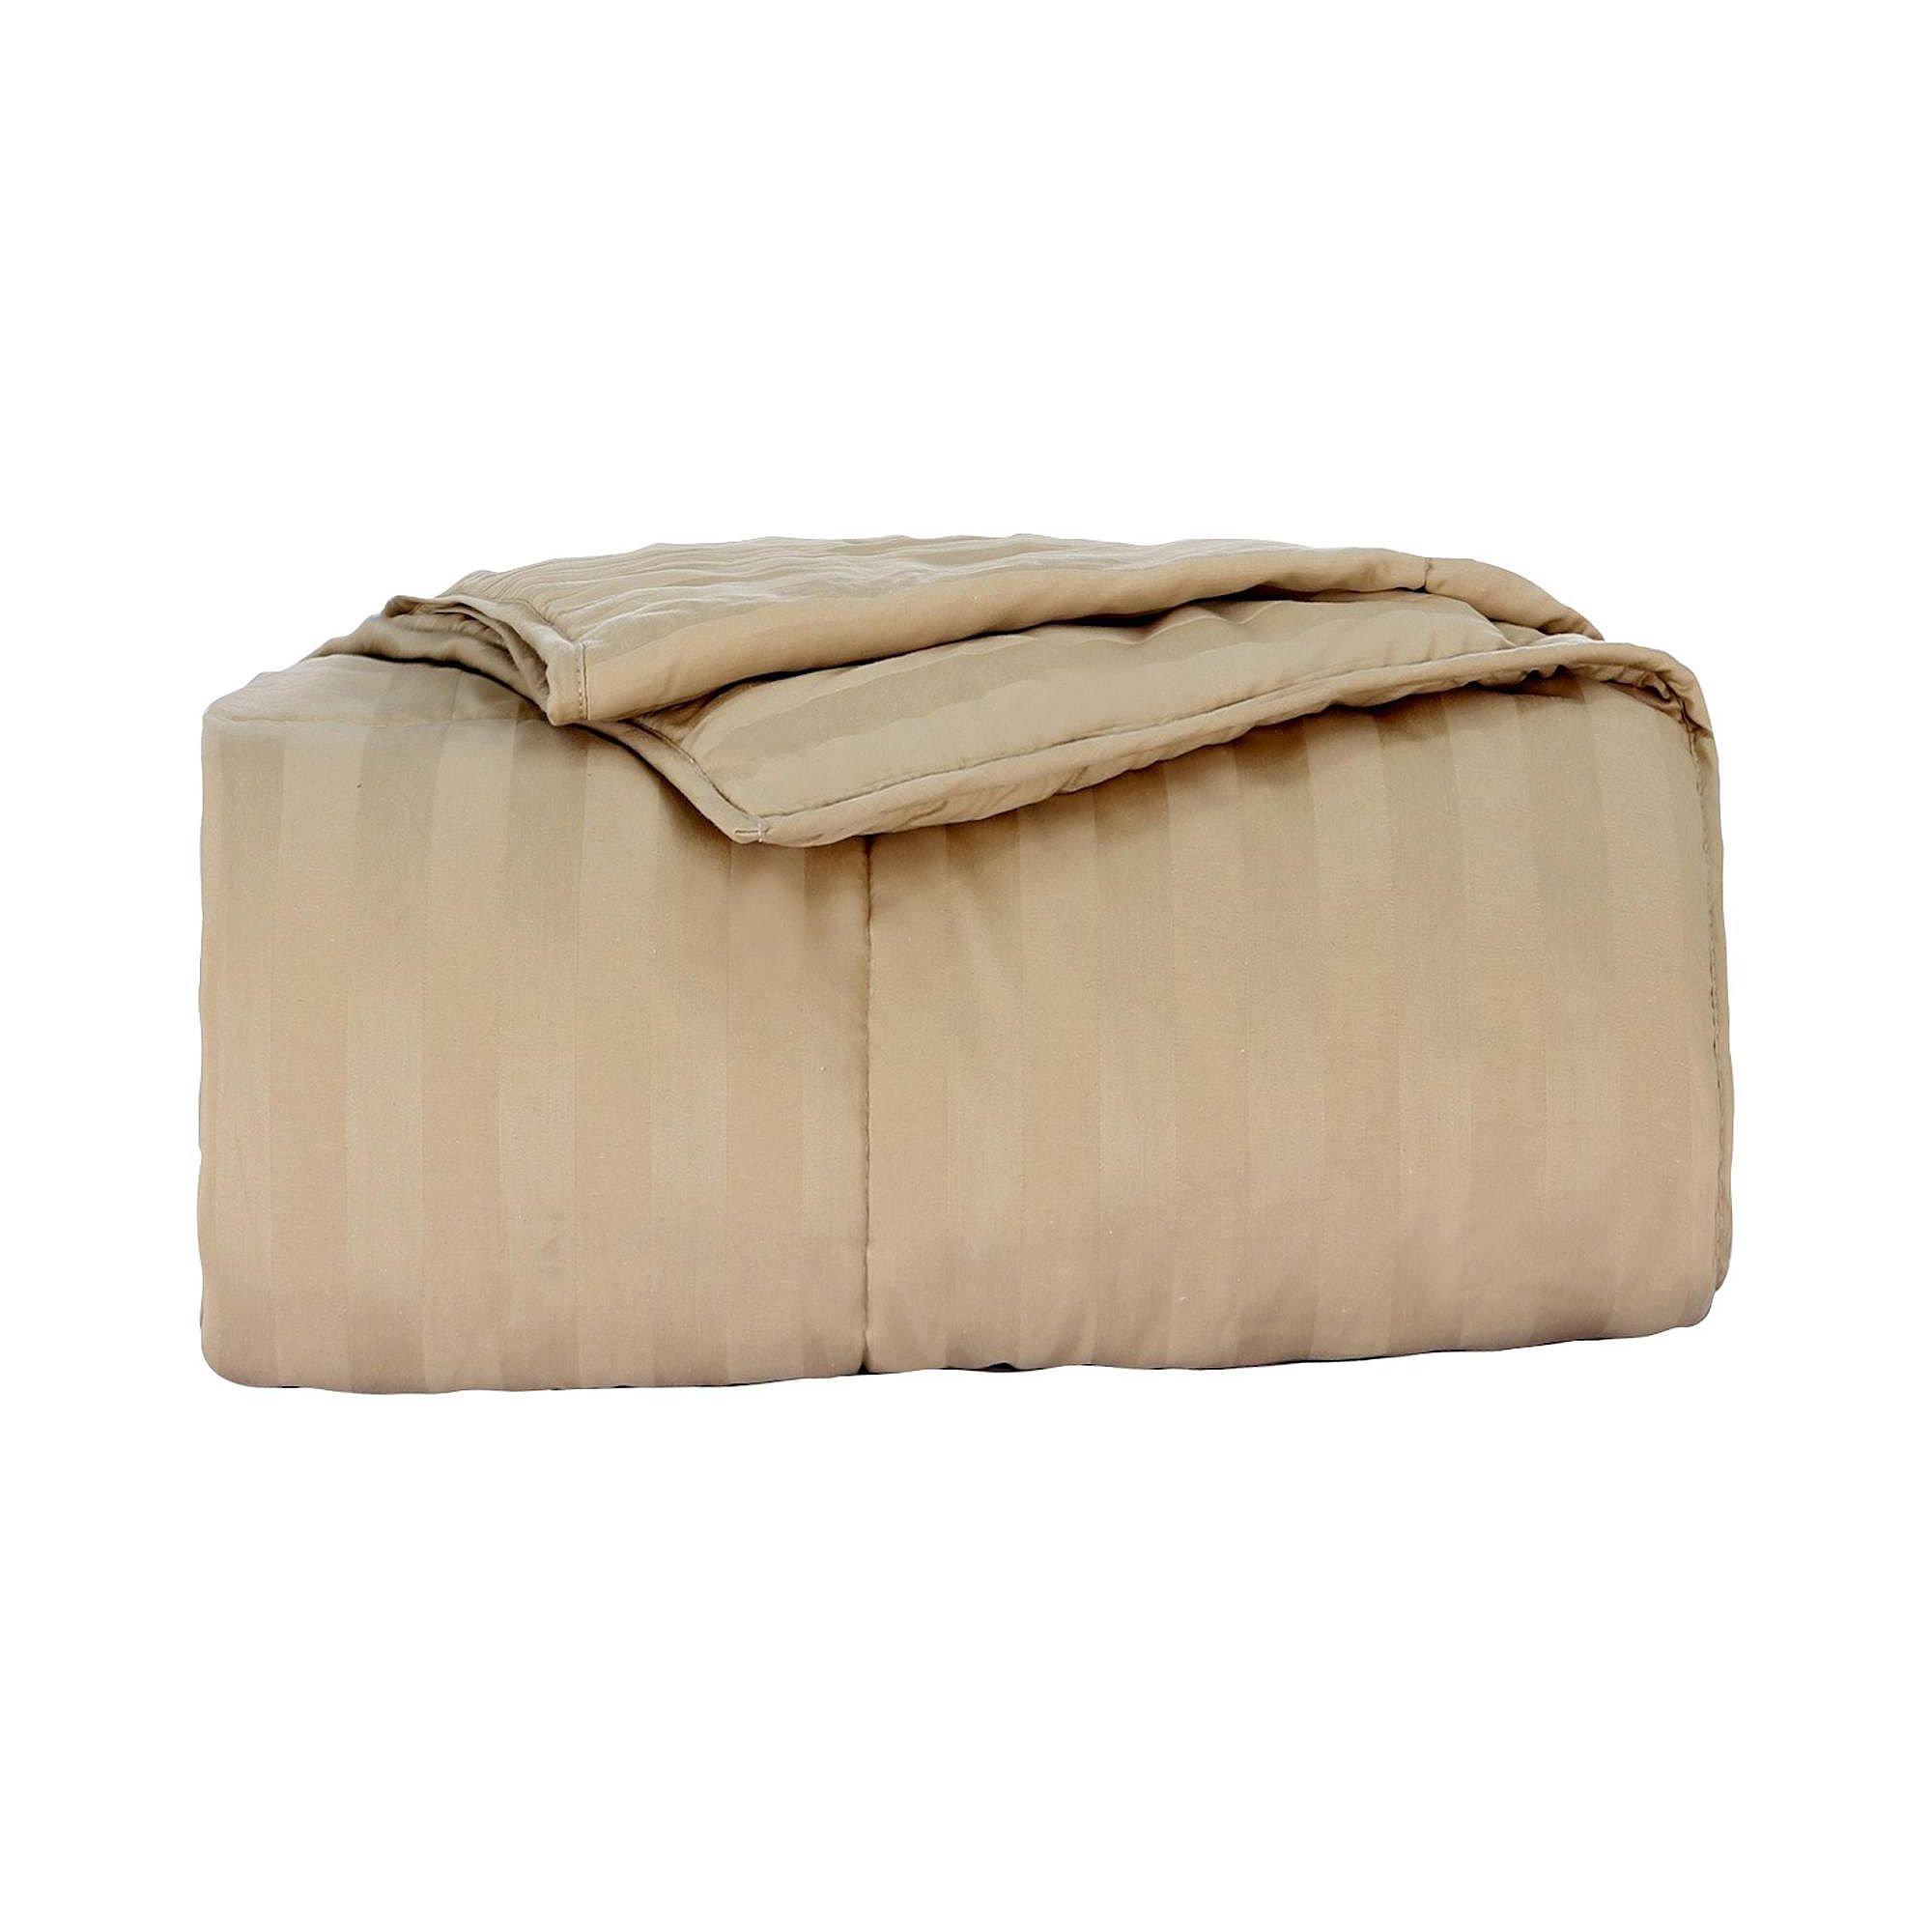 Cotton Loft Blanket